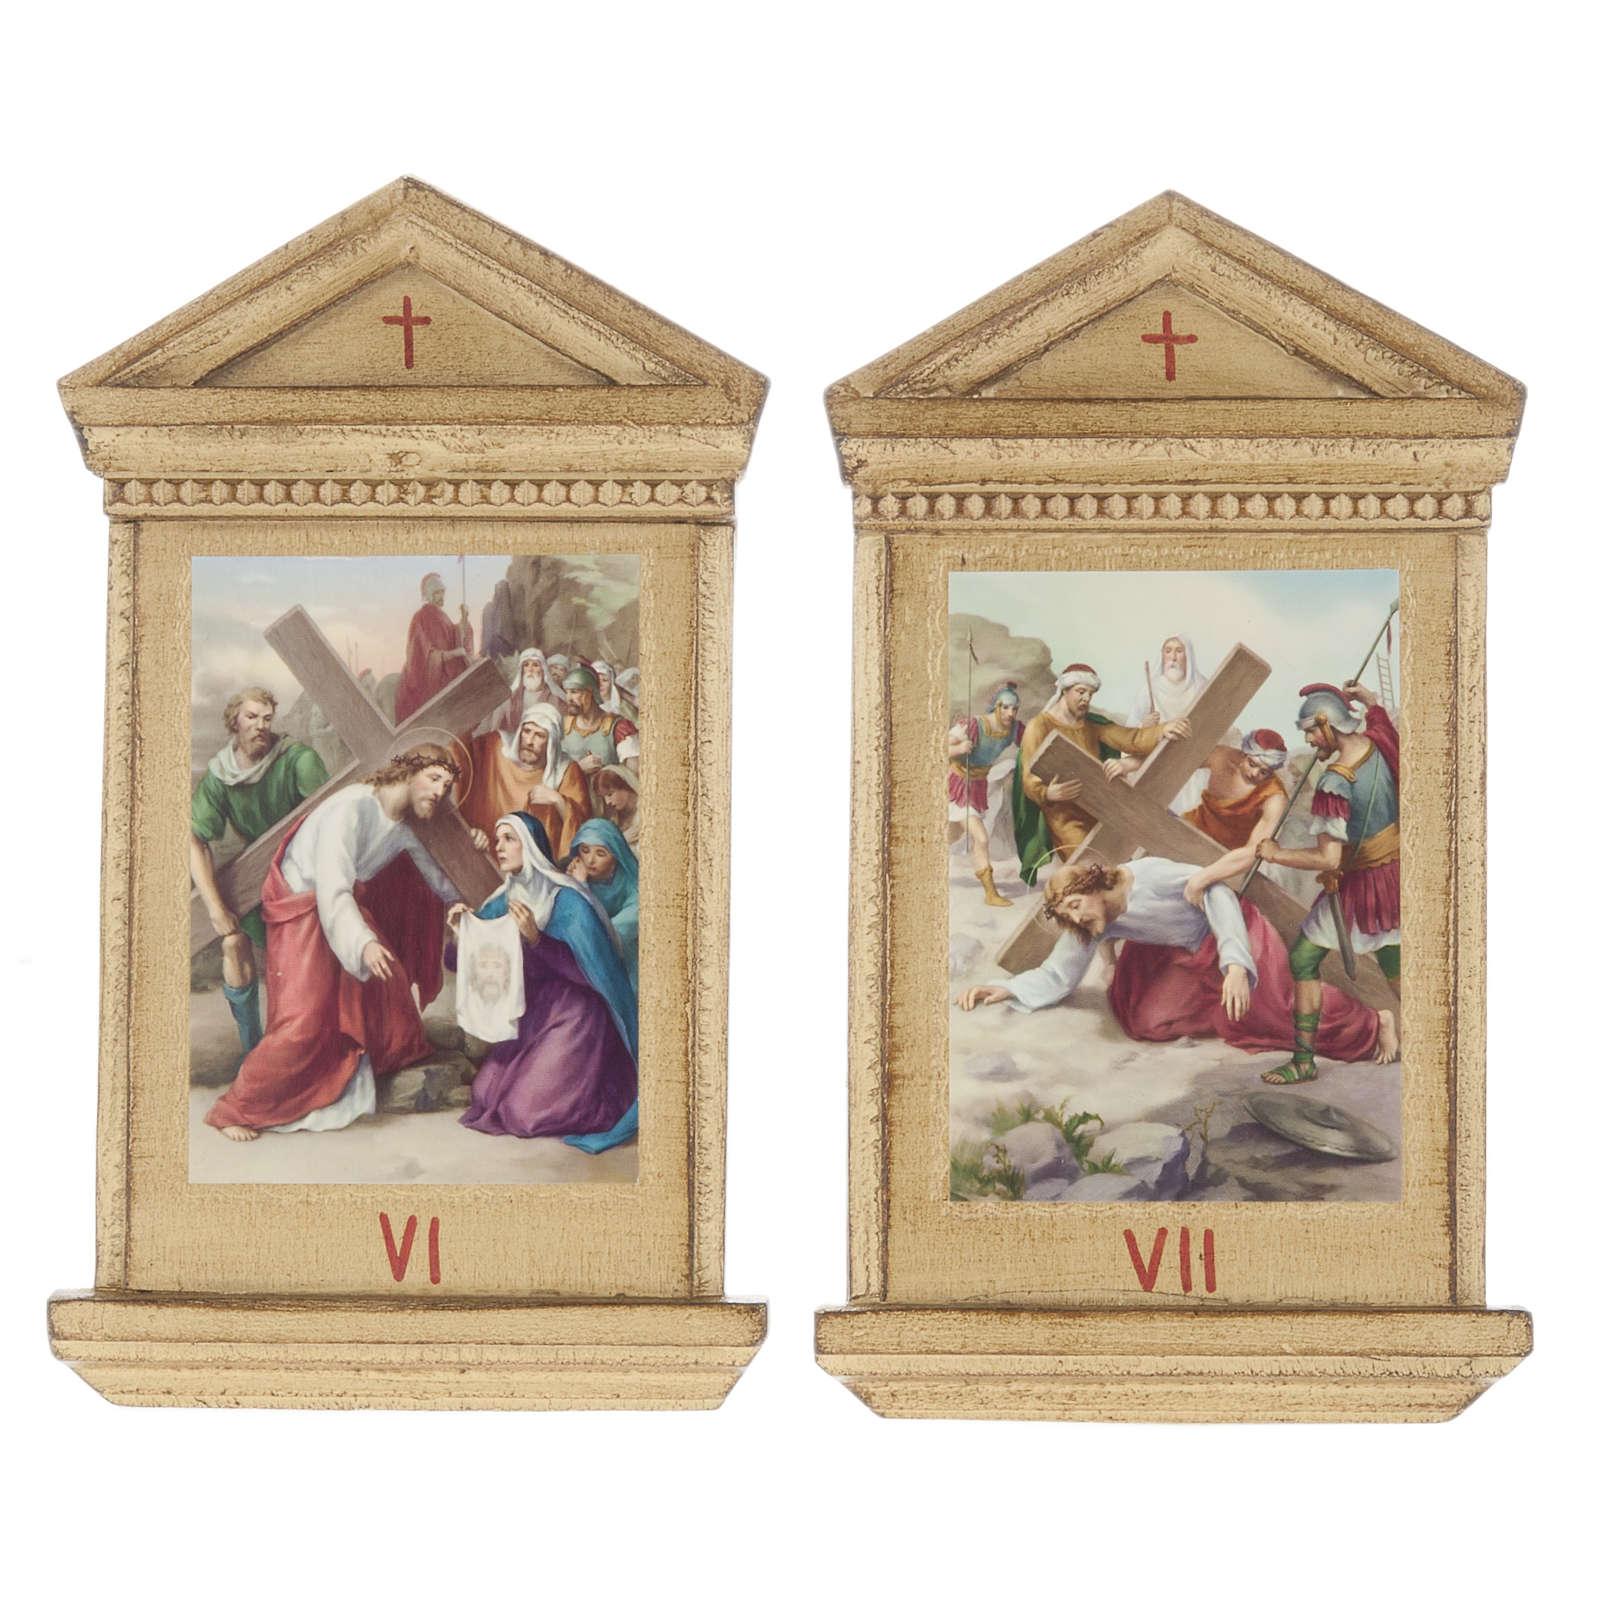 Via Crucis altar de madera XV estaciones 4